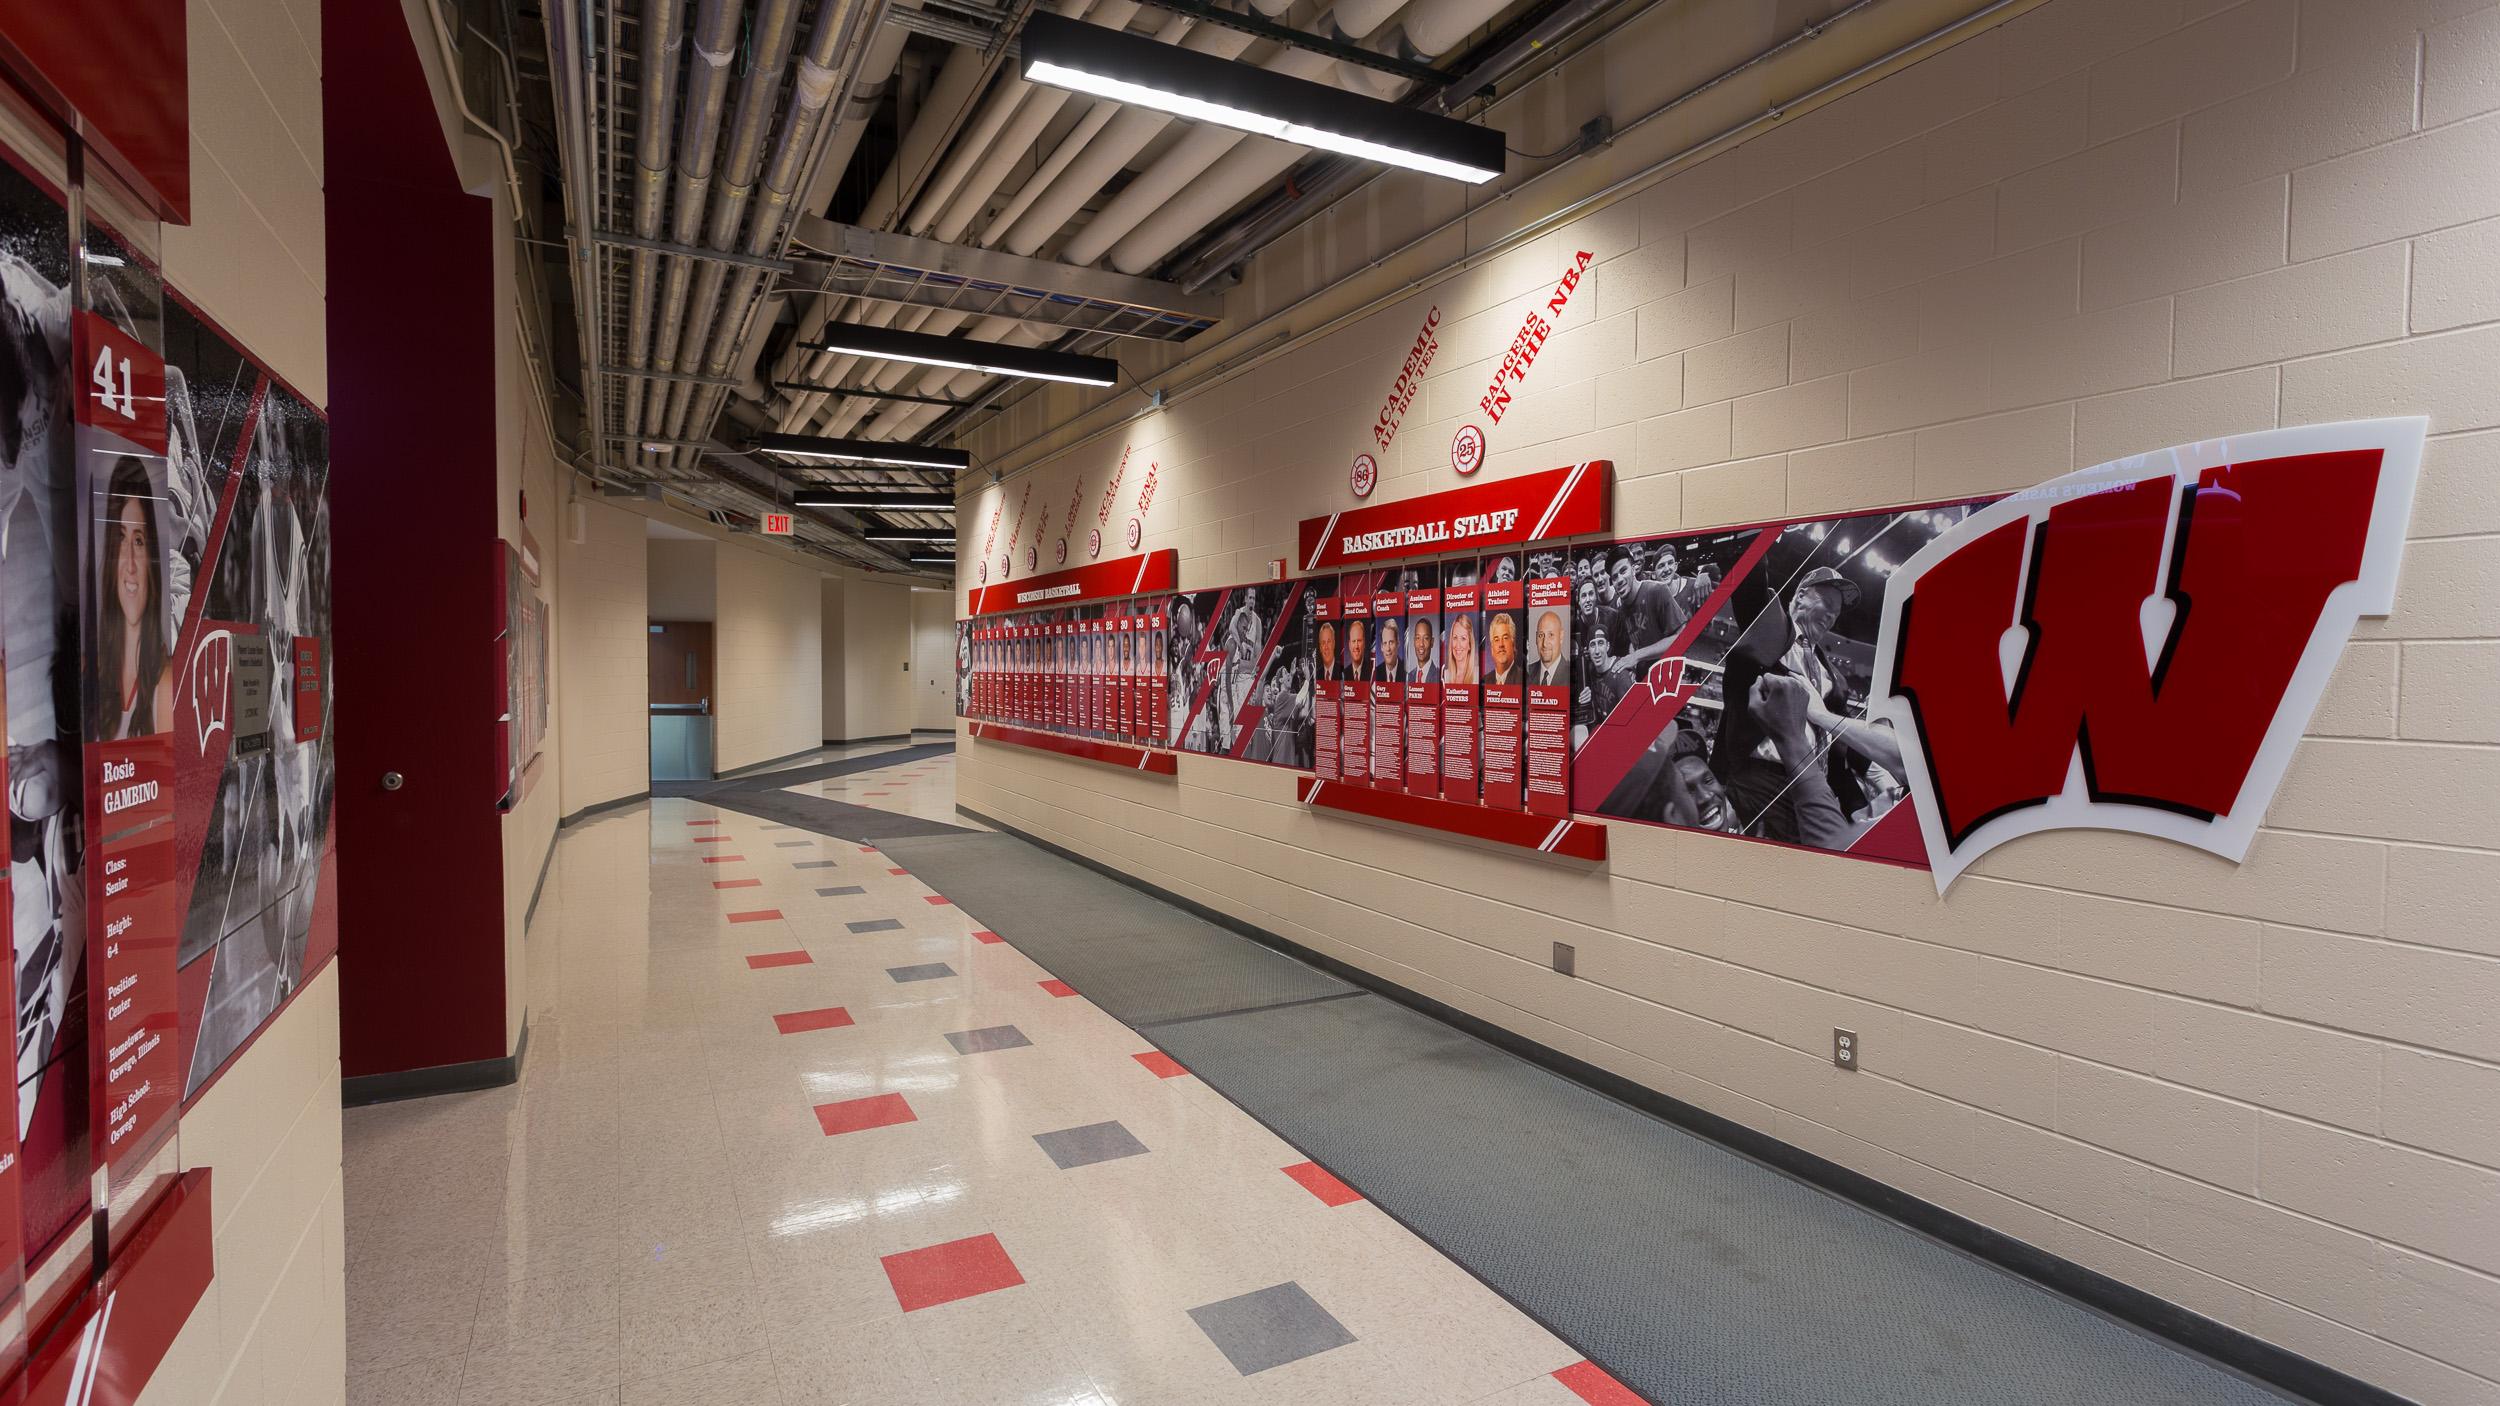 Facility Branding & Wall Graphics Displays